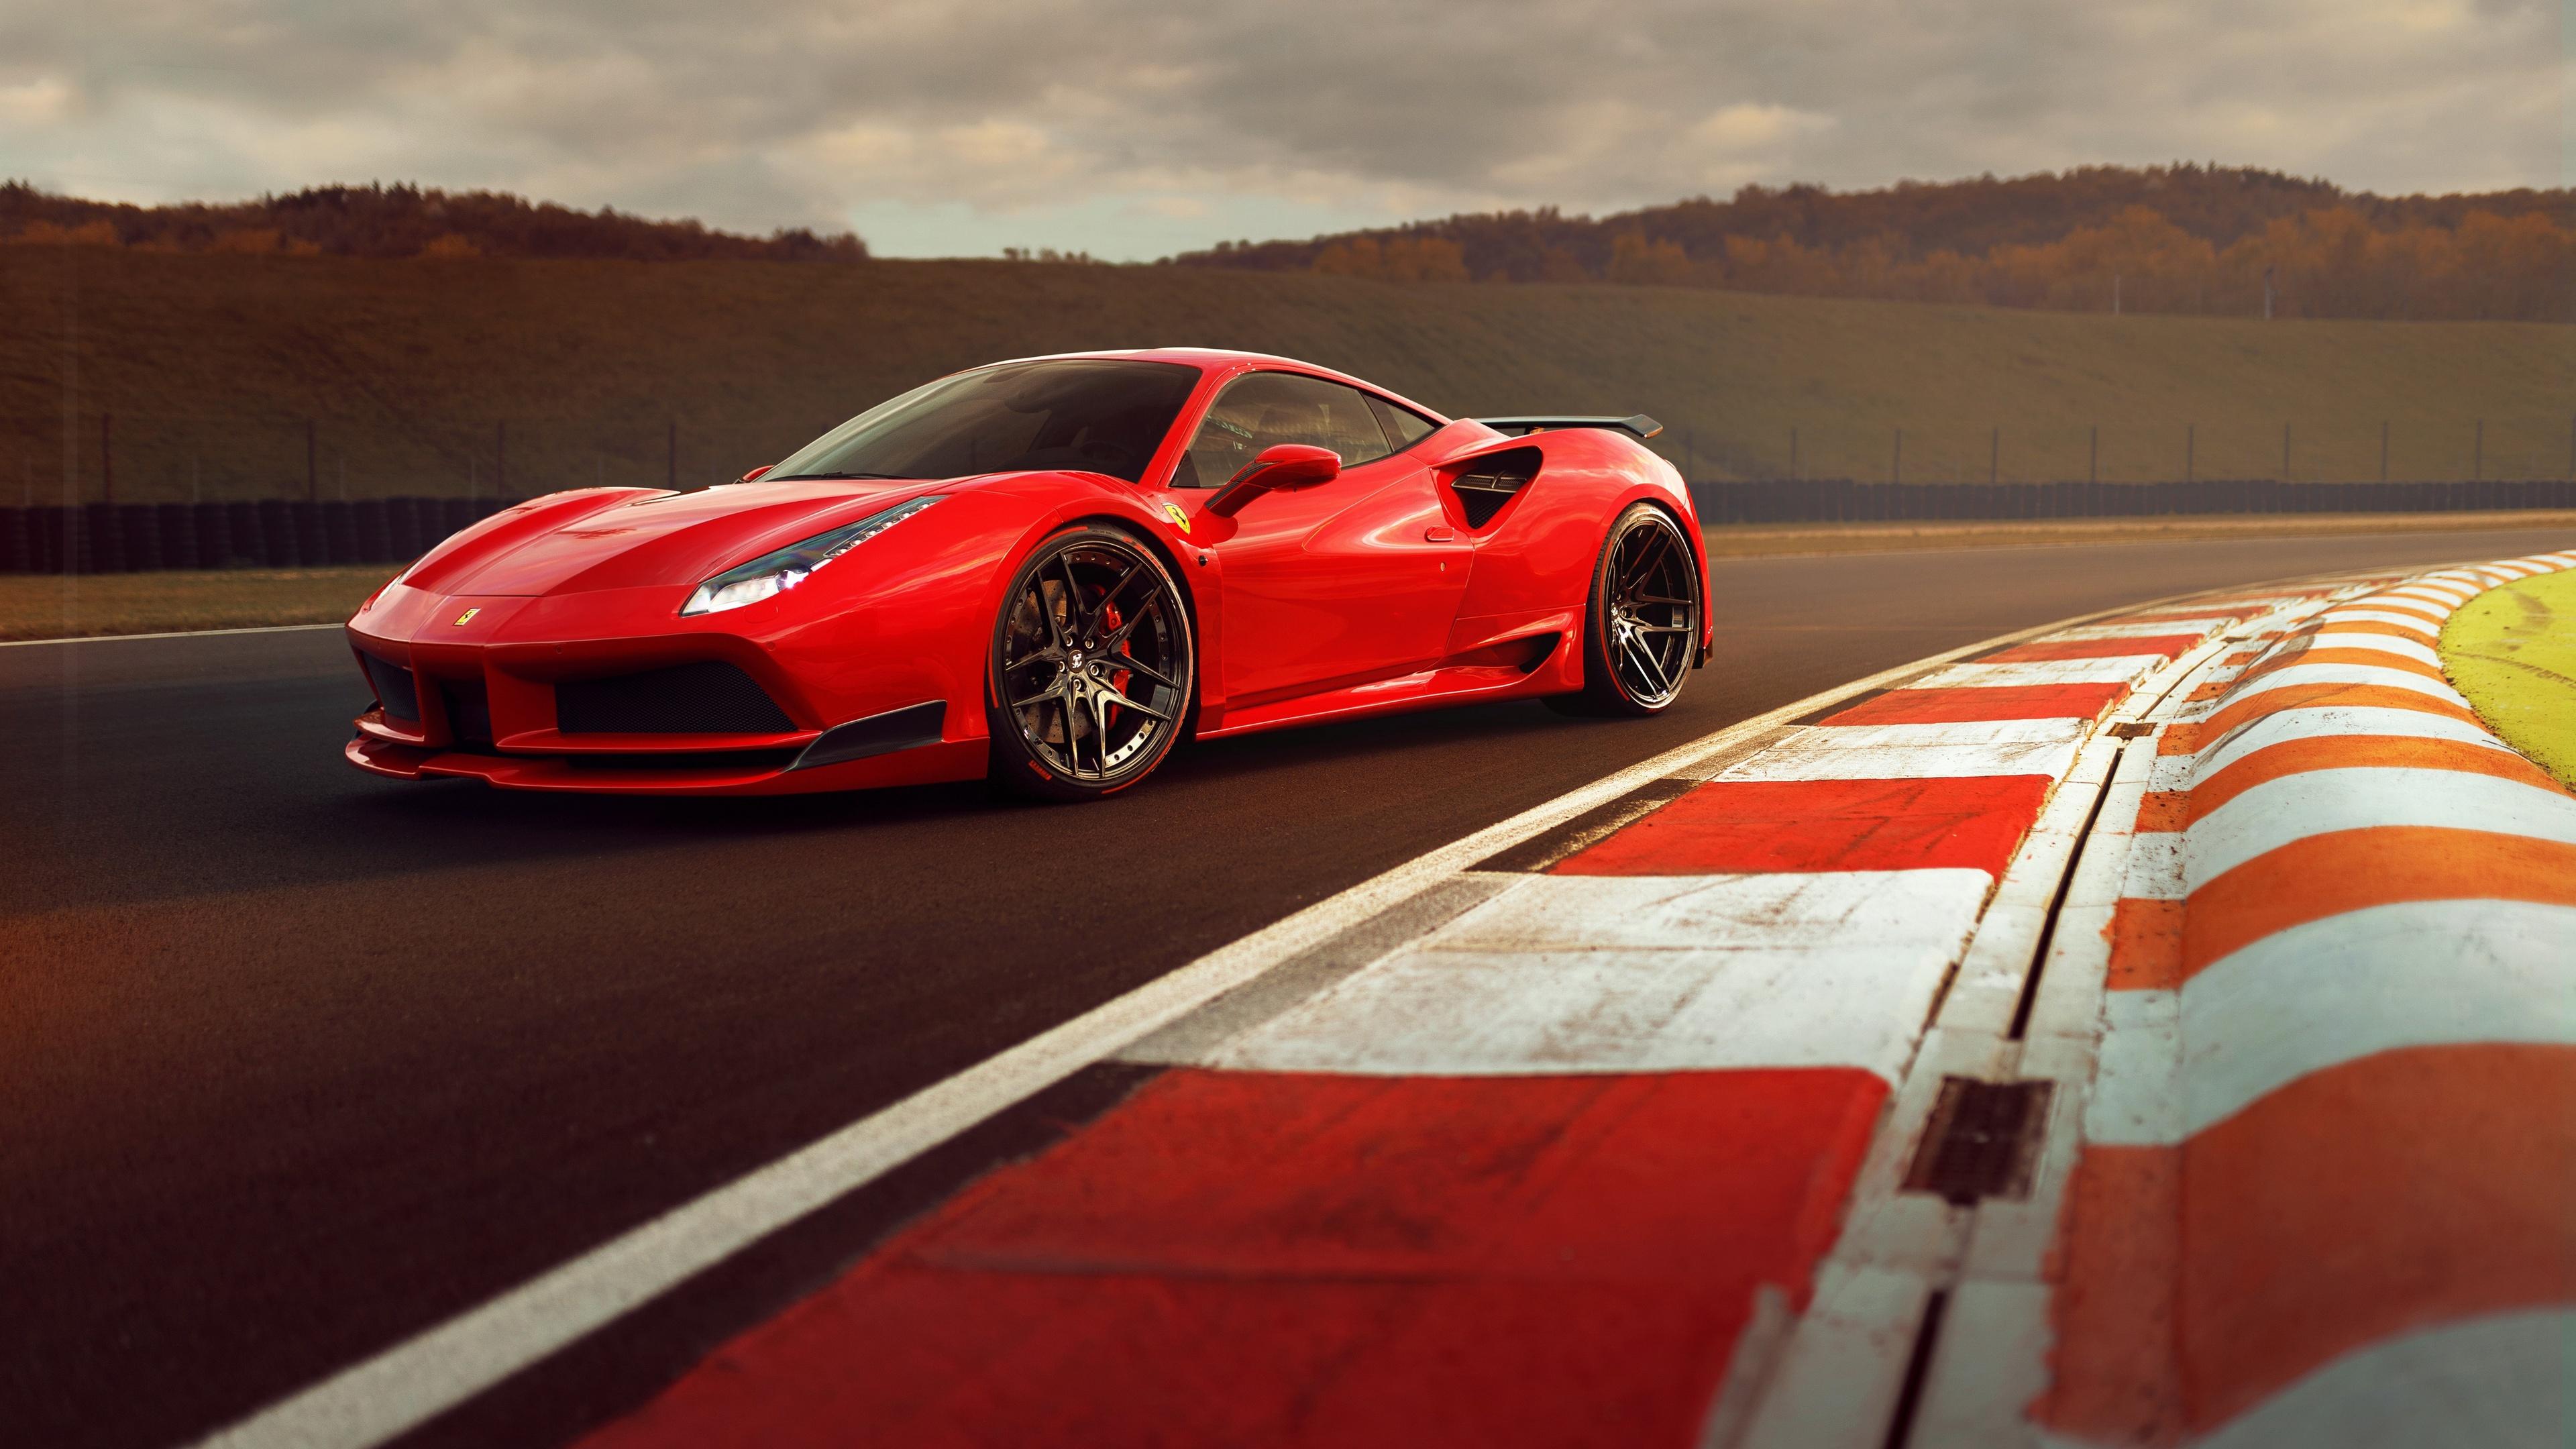 ferrari 488 gtb 4k 1539105505 - Ferrari 488 Gtb 4k - hd-wallpapers, ferrari wallpapers, ferrari 488 wallpapers, 4k-wallpapers, 2017 cars wallpapers